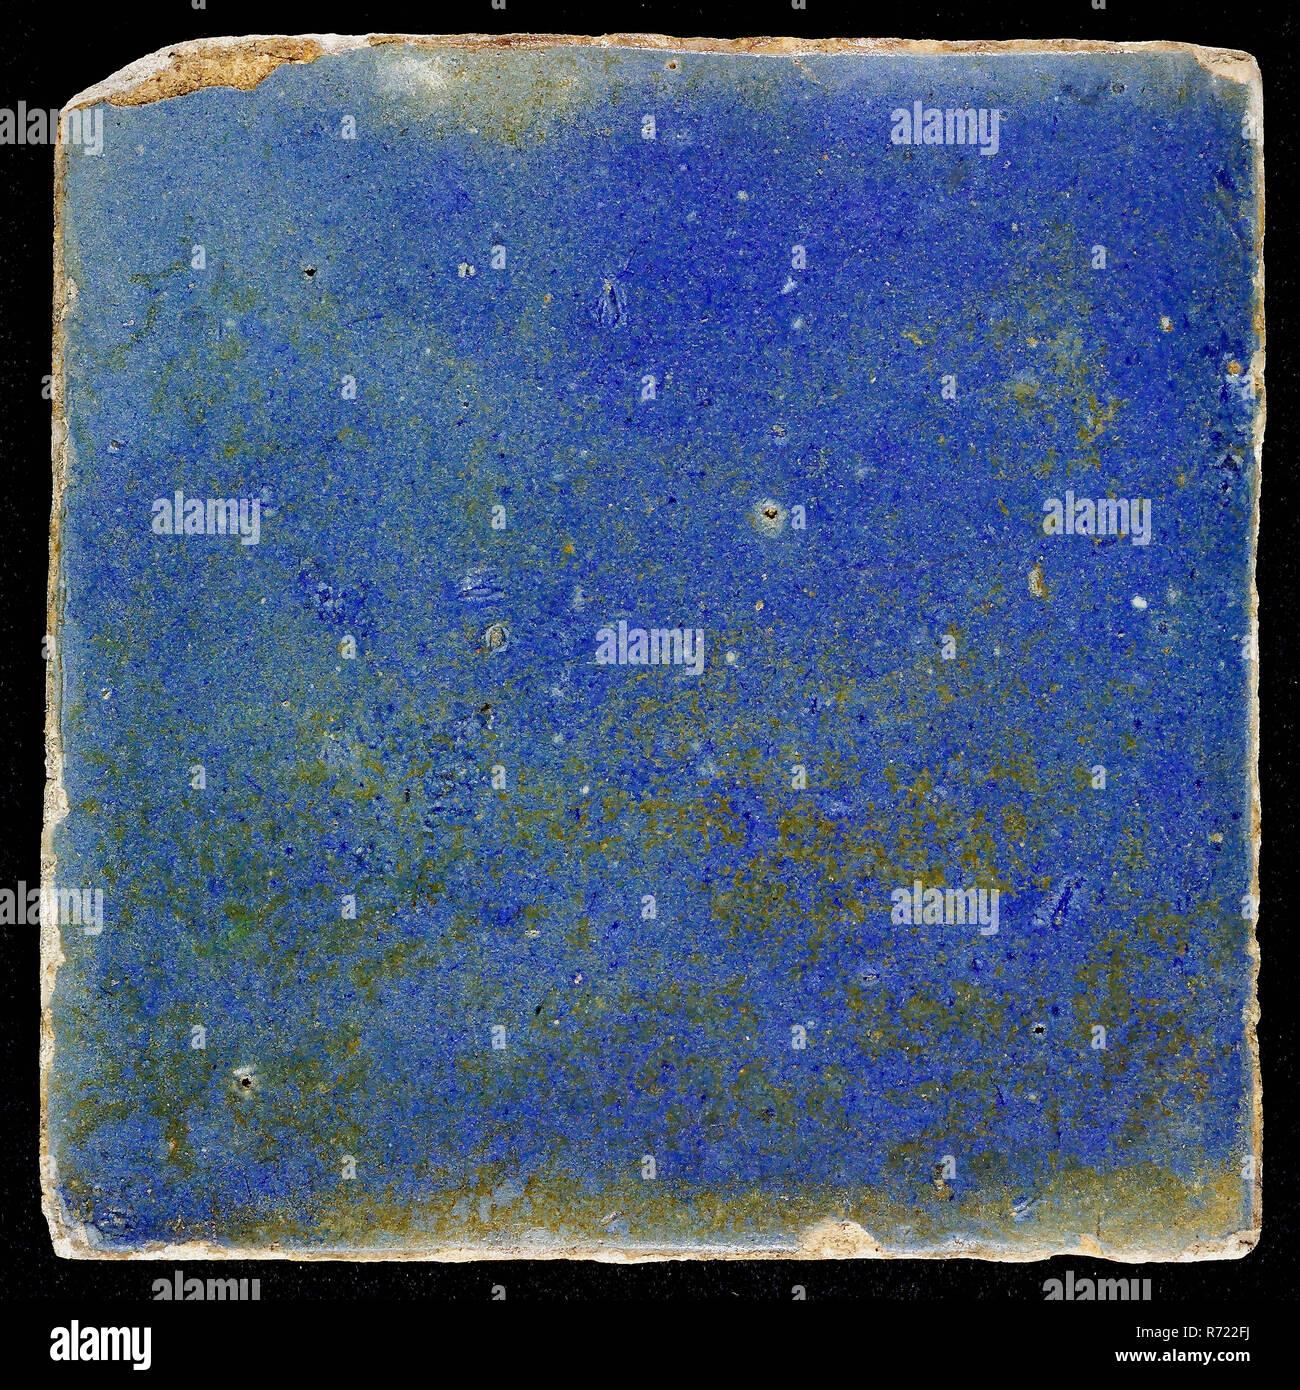 Plain blue floor tile or wall tile, wall tile? floor tile? tile sculpture ceramic earthenware glaze tin glaze, in shape made baked glazed painted baked Wall tile or floor tile. Orange-brown shard. Completely solid blue Possible iridescence in the glaze layer. Slanted sides of indigenous pottery - Stock Image